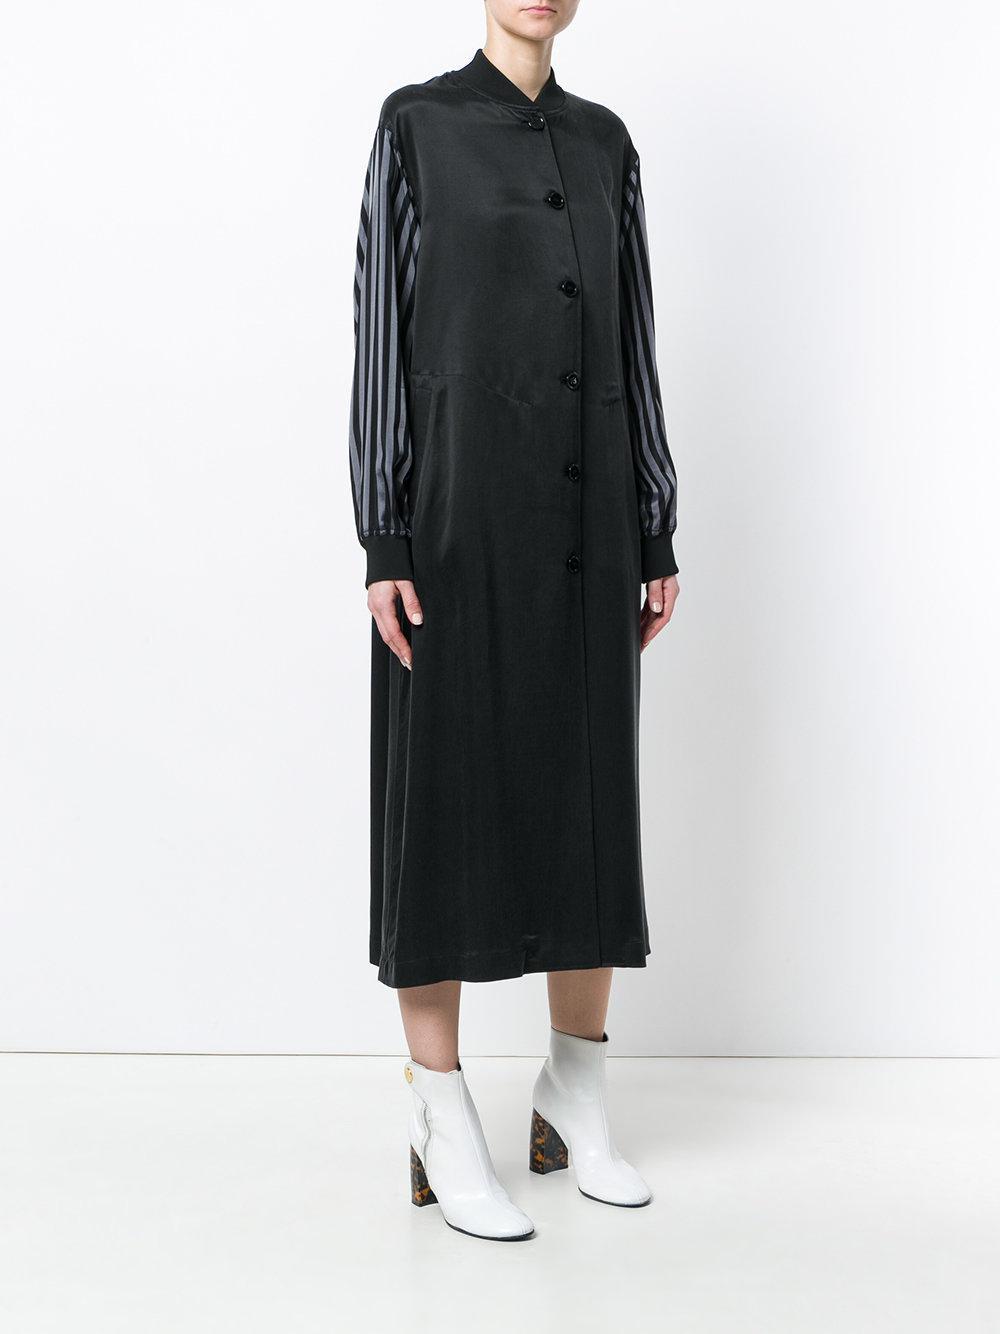 bell sleeve bomber dress - Black Maison Martin Margiela NCjha63JU